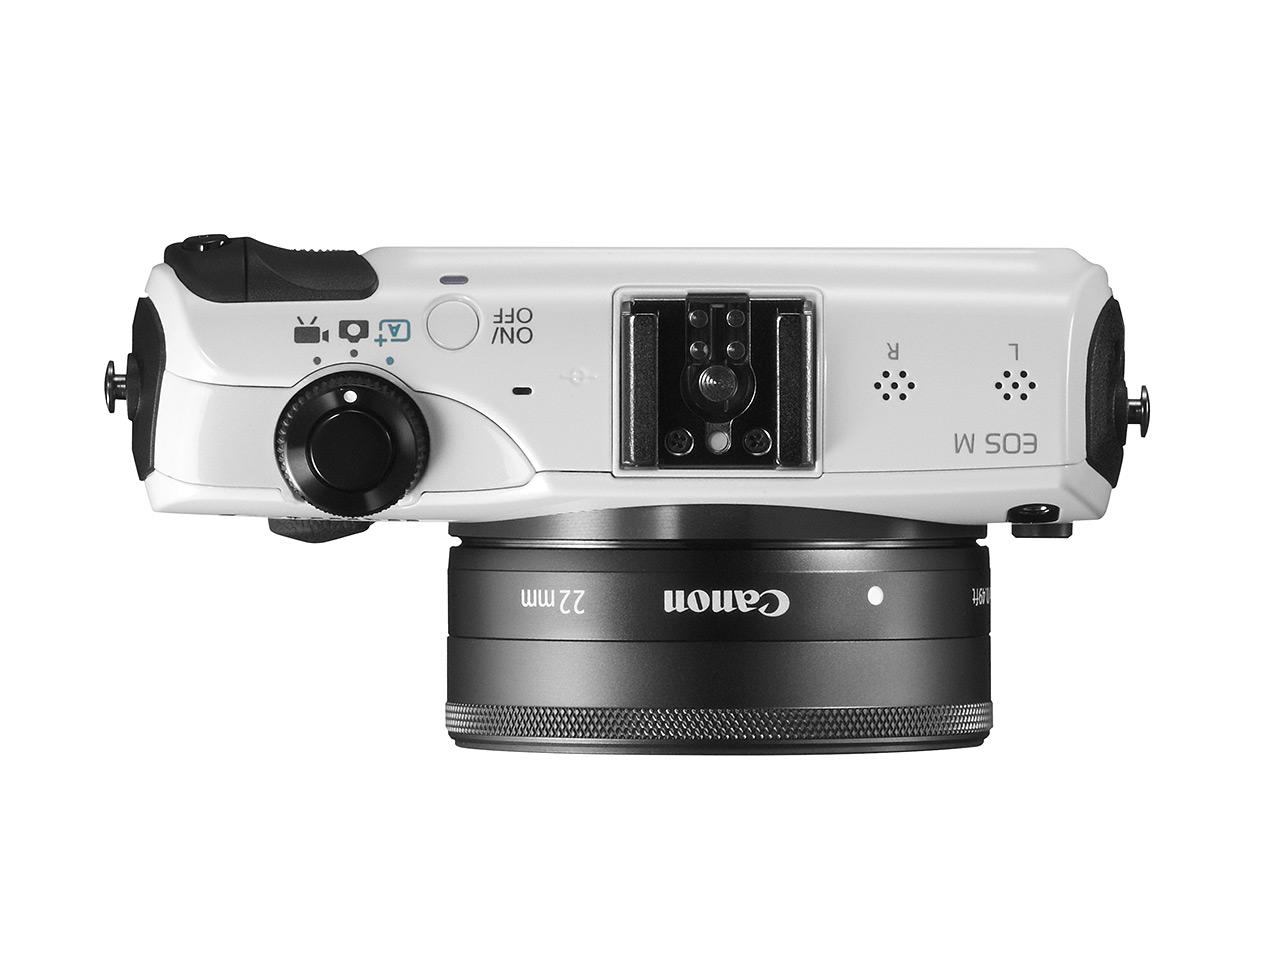 Canon EOS-M ด้านบน แสดงให้เห็น Hot-shoe ที่เอาไว้ต่อแฟลชภายนอกและปุ่มหมุนควบคุมหลัก